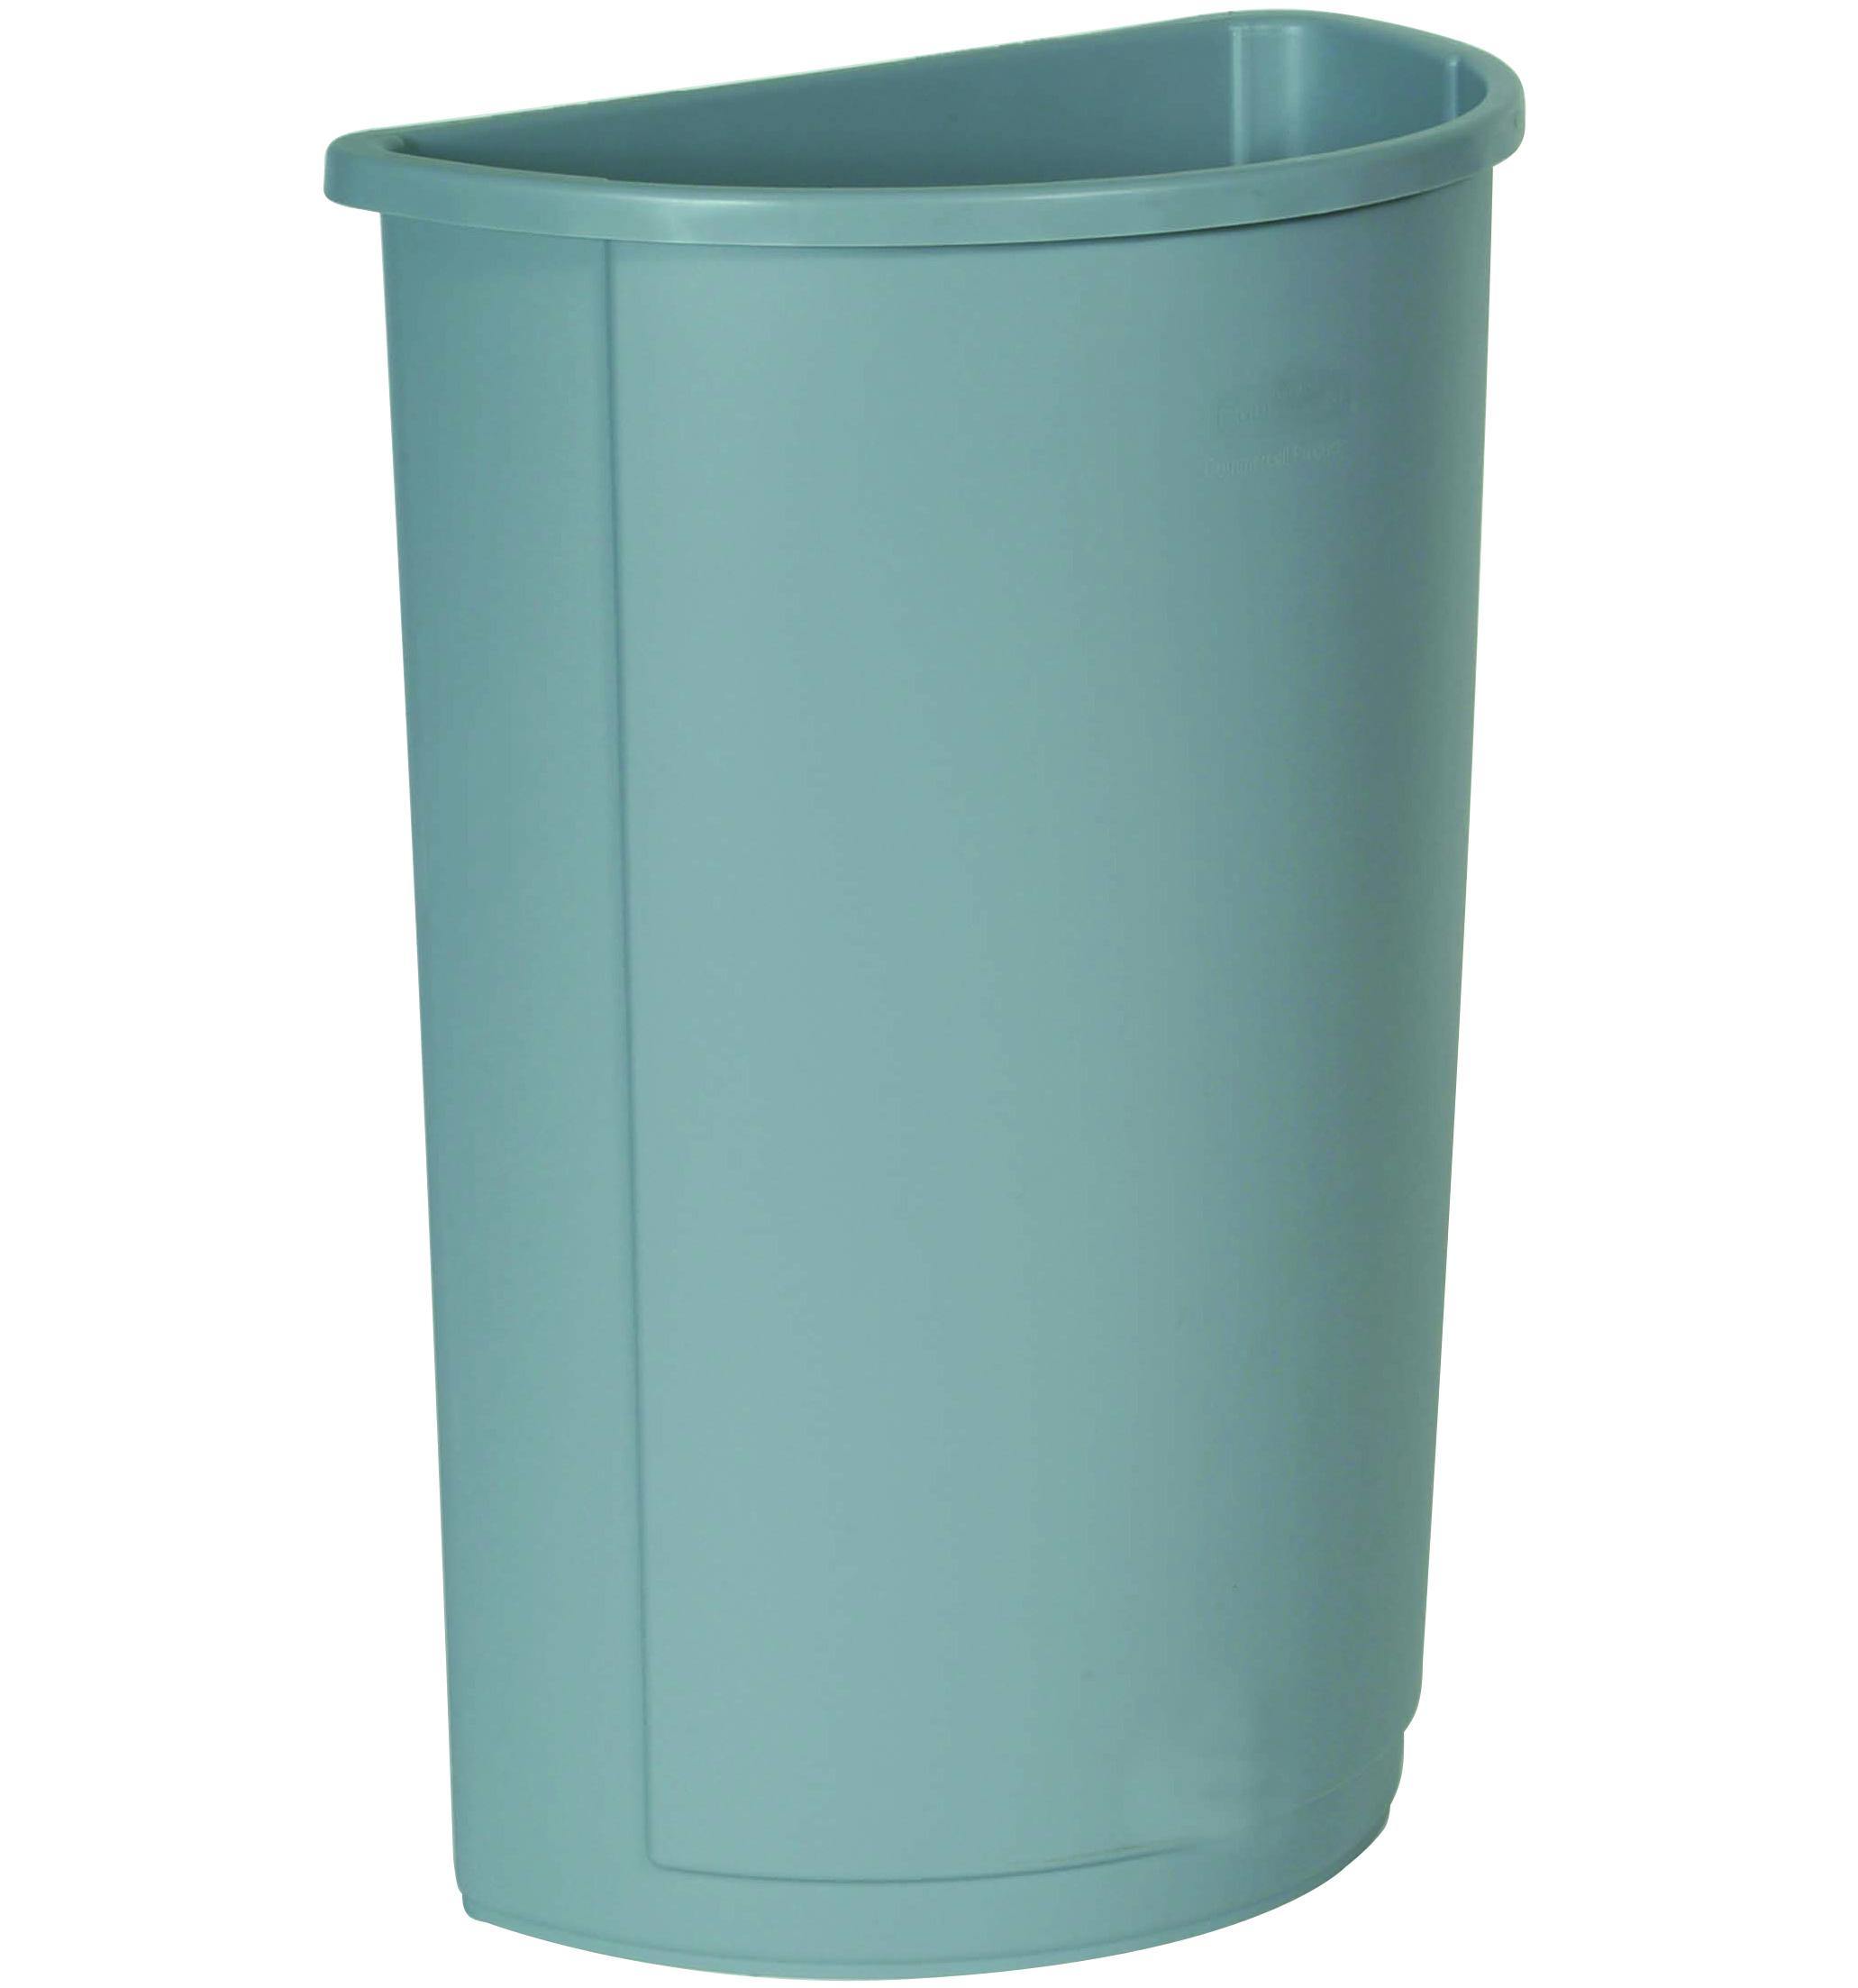 Untouchable Half Round Waste Container